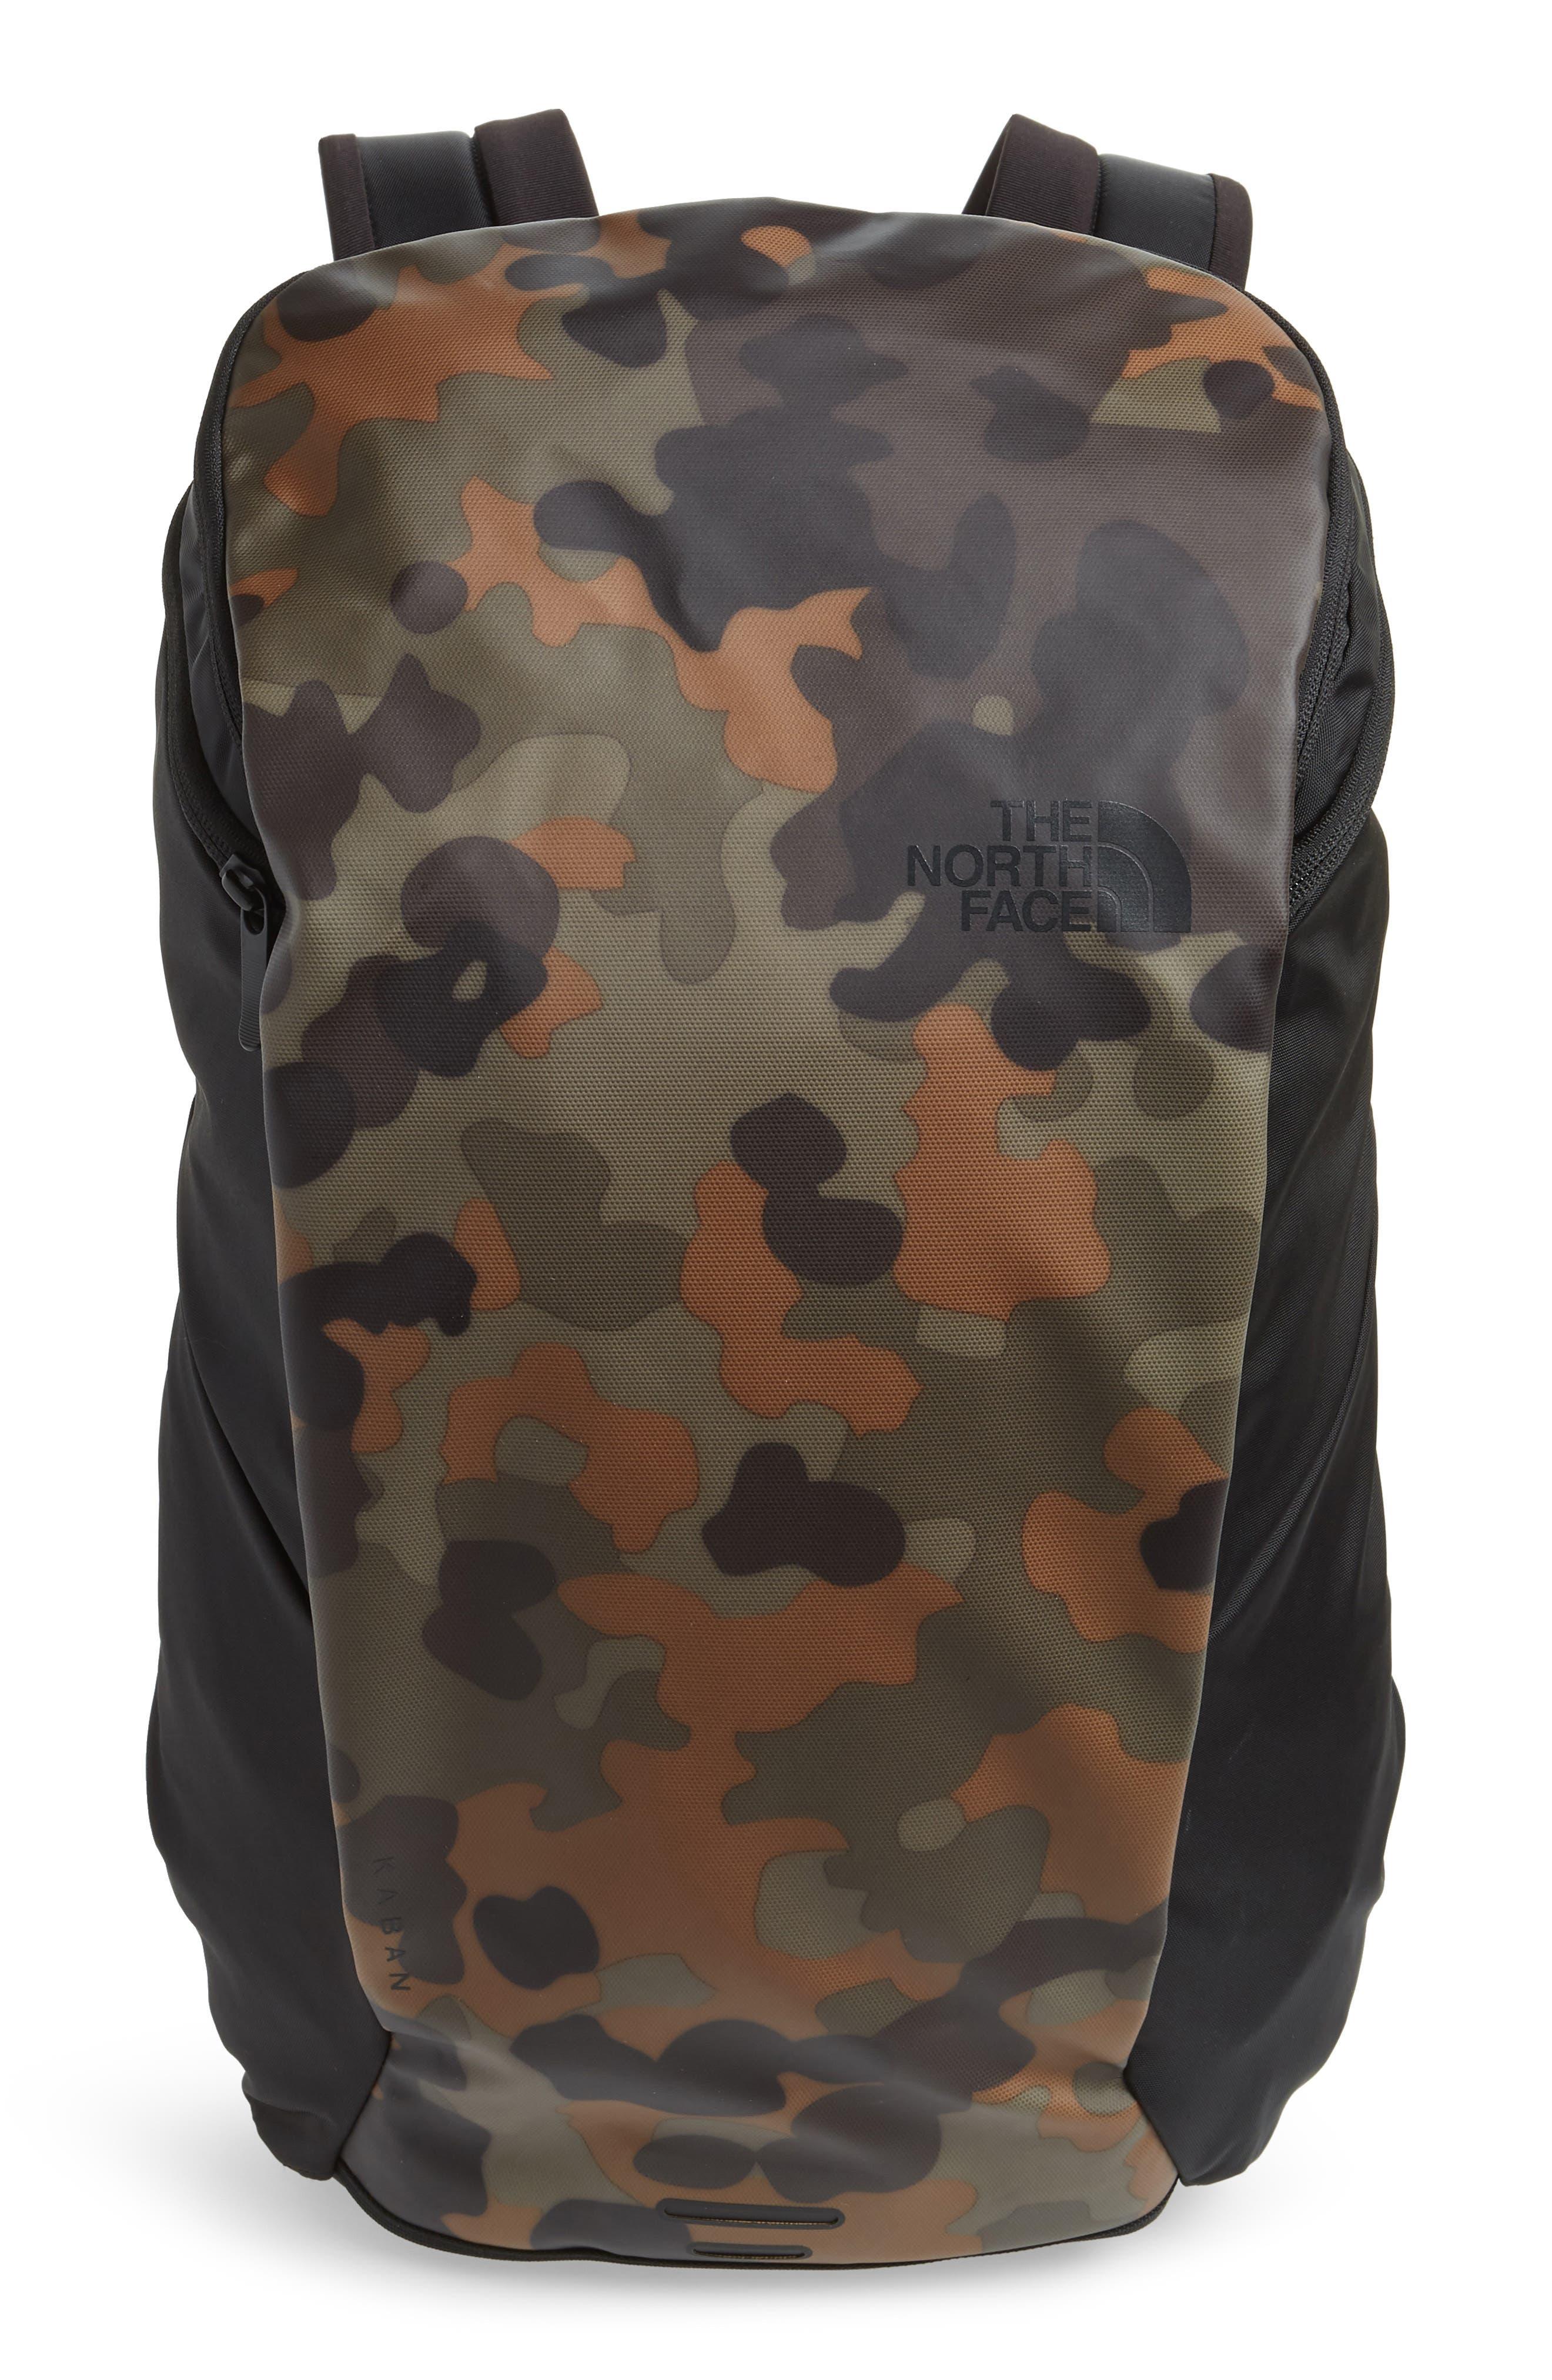 Ka-Ban Backpack,                         Main,                         color, TAUPE GREEN/ MACROFLECK PRINT